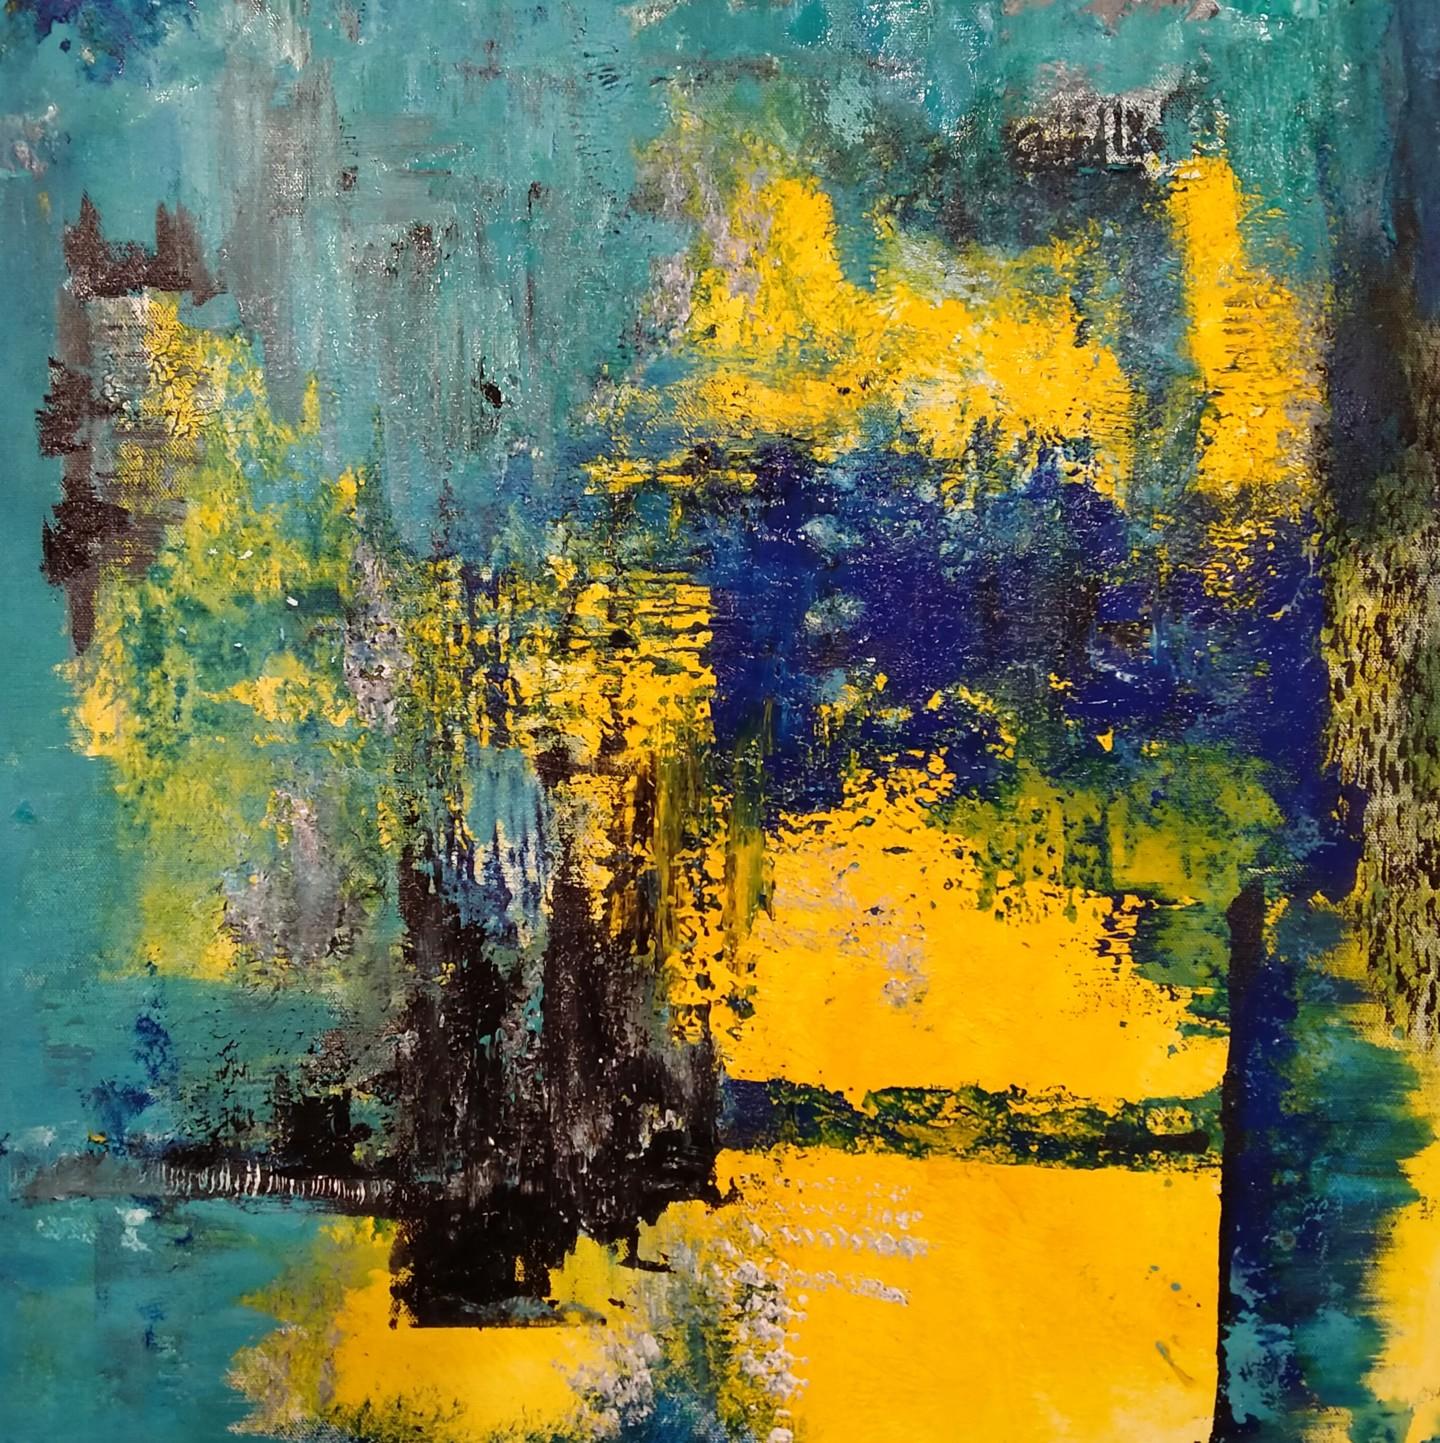 Atignas Art - Mirage